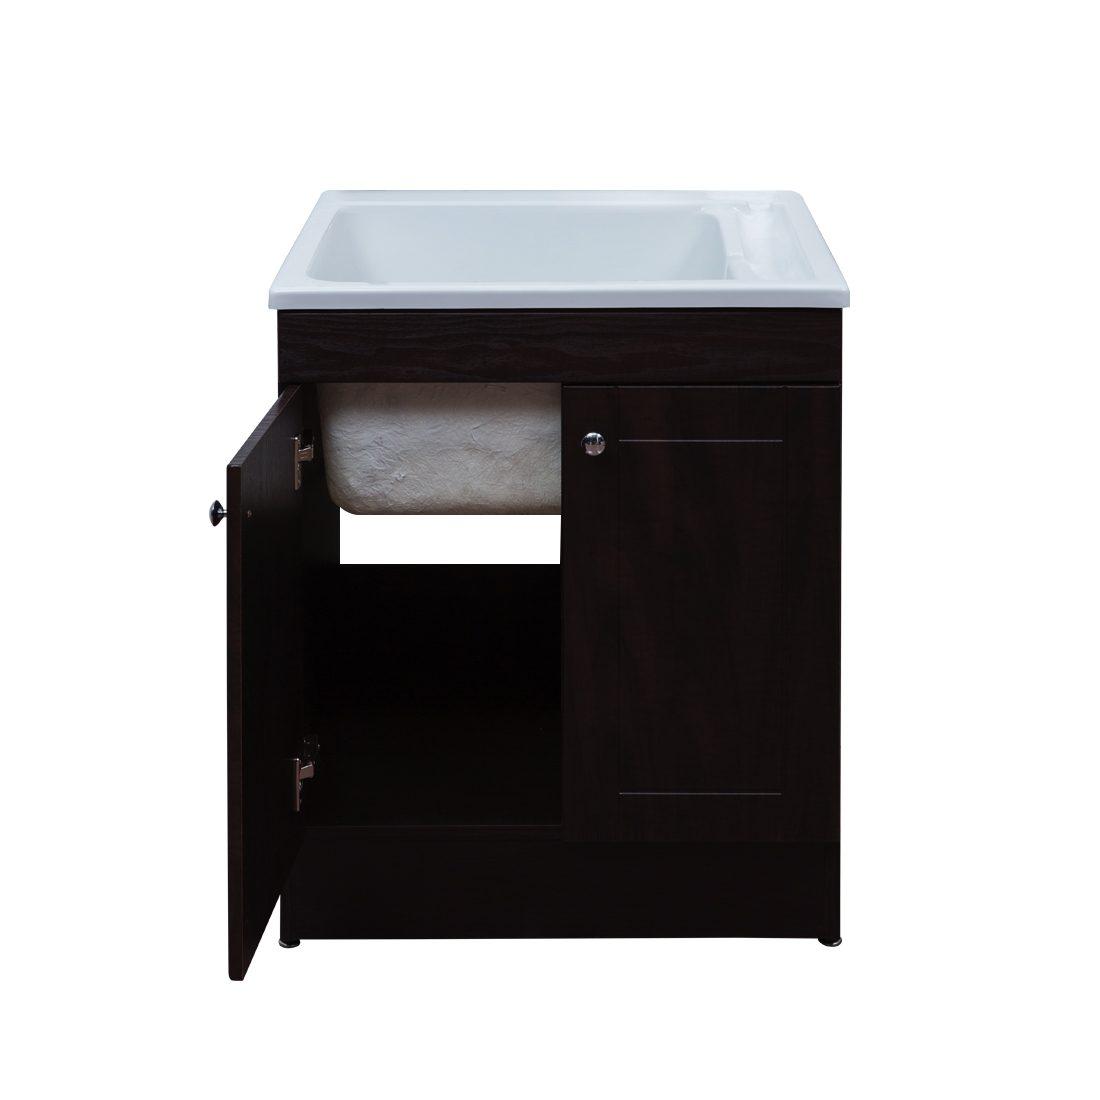 Hagen 24.4inch Laundry Cabinet Espresso Inside View